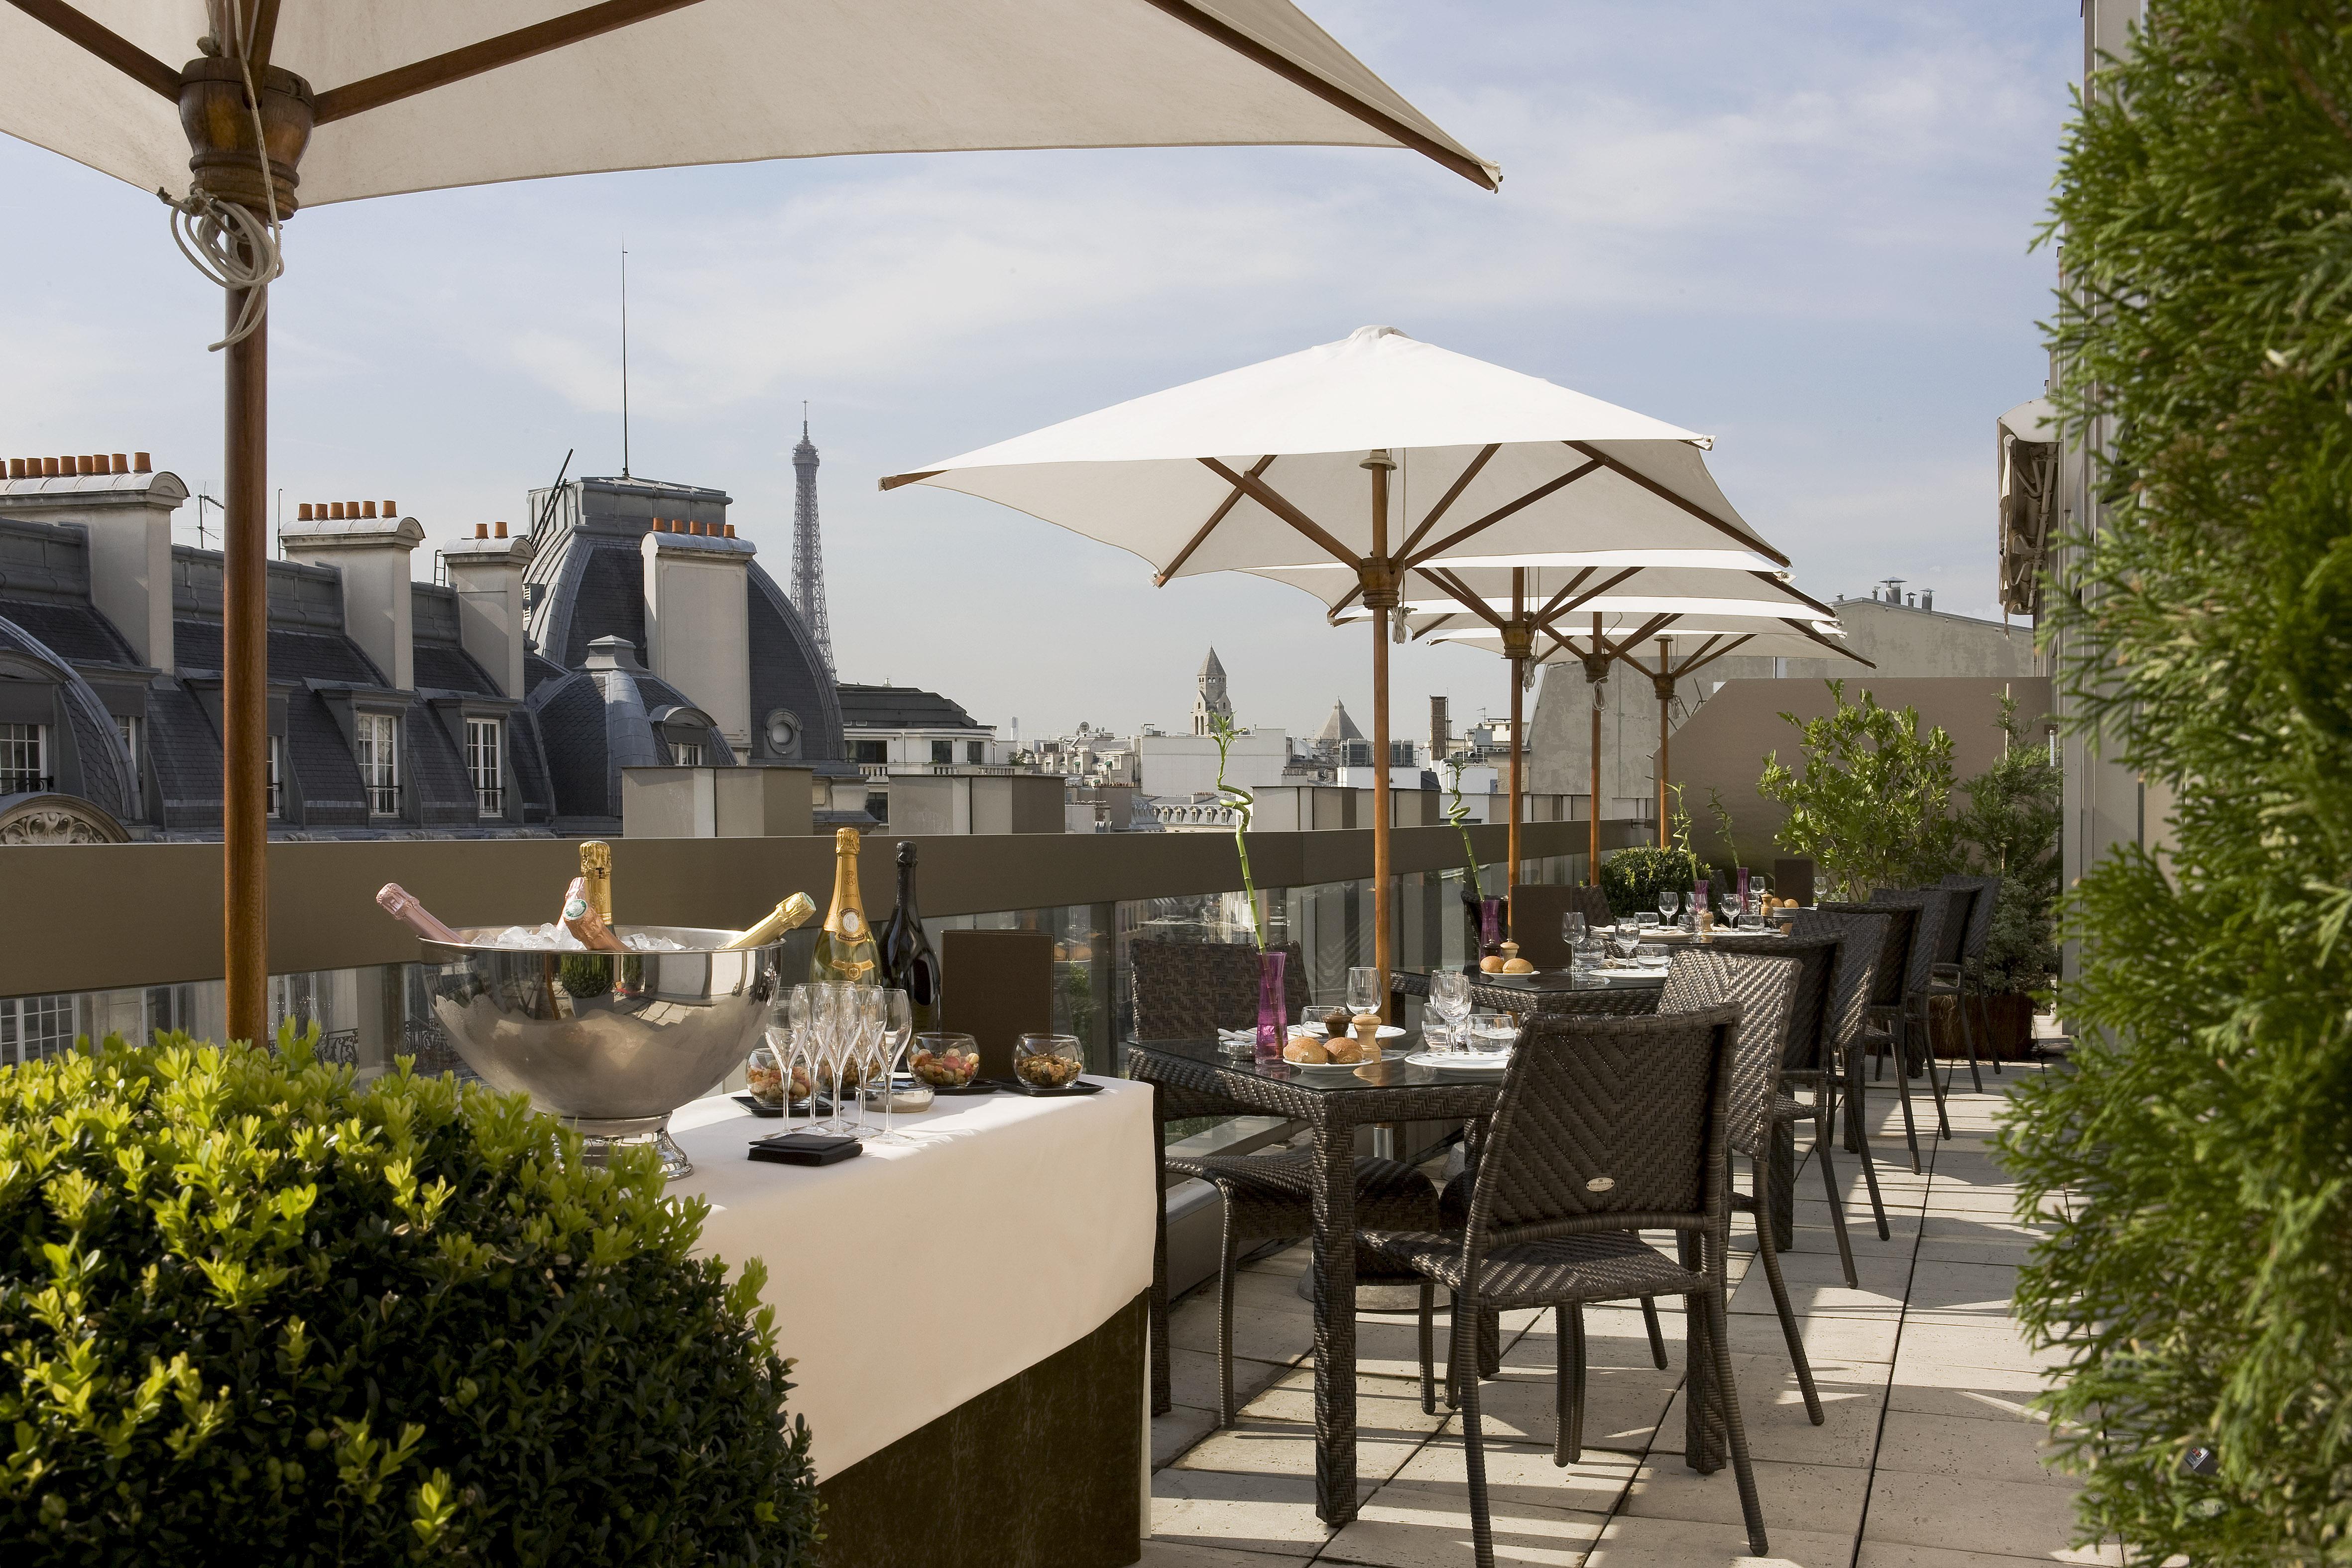 Restaurant paris avec terrasse toit